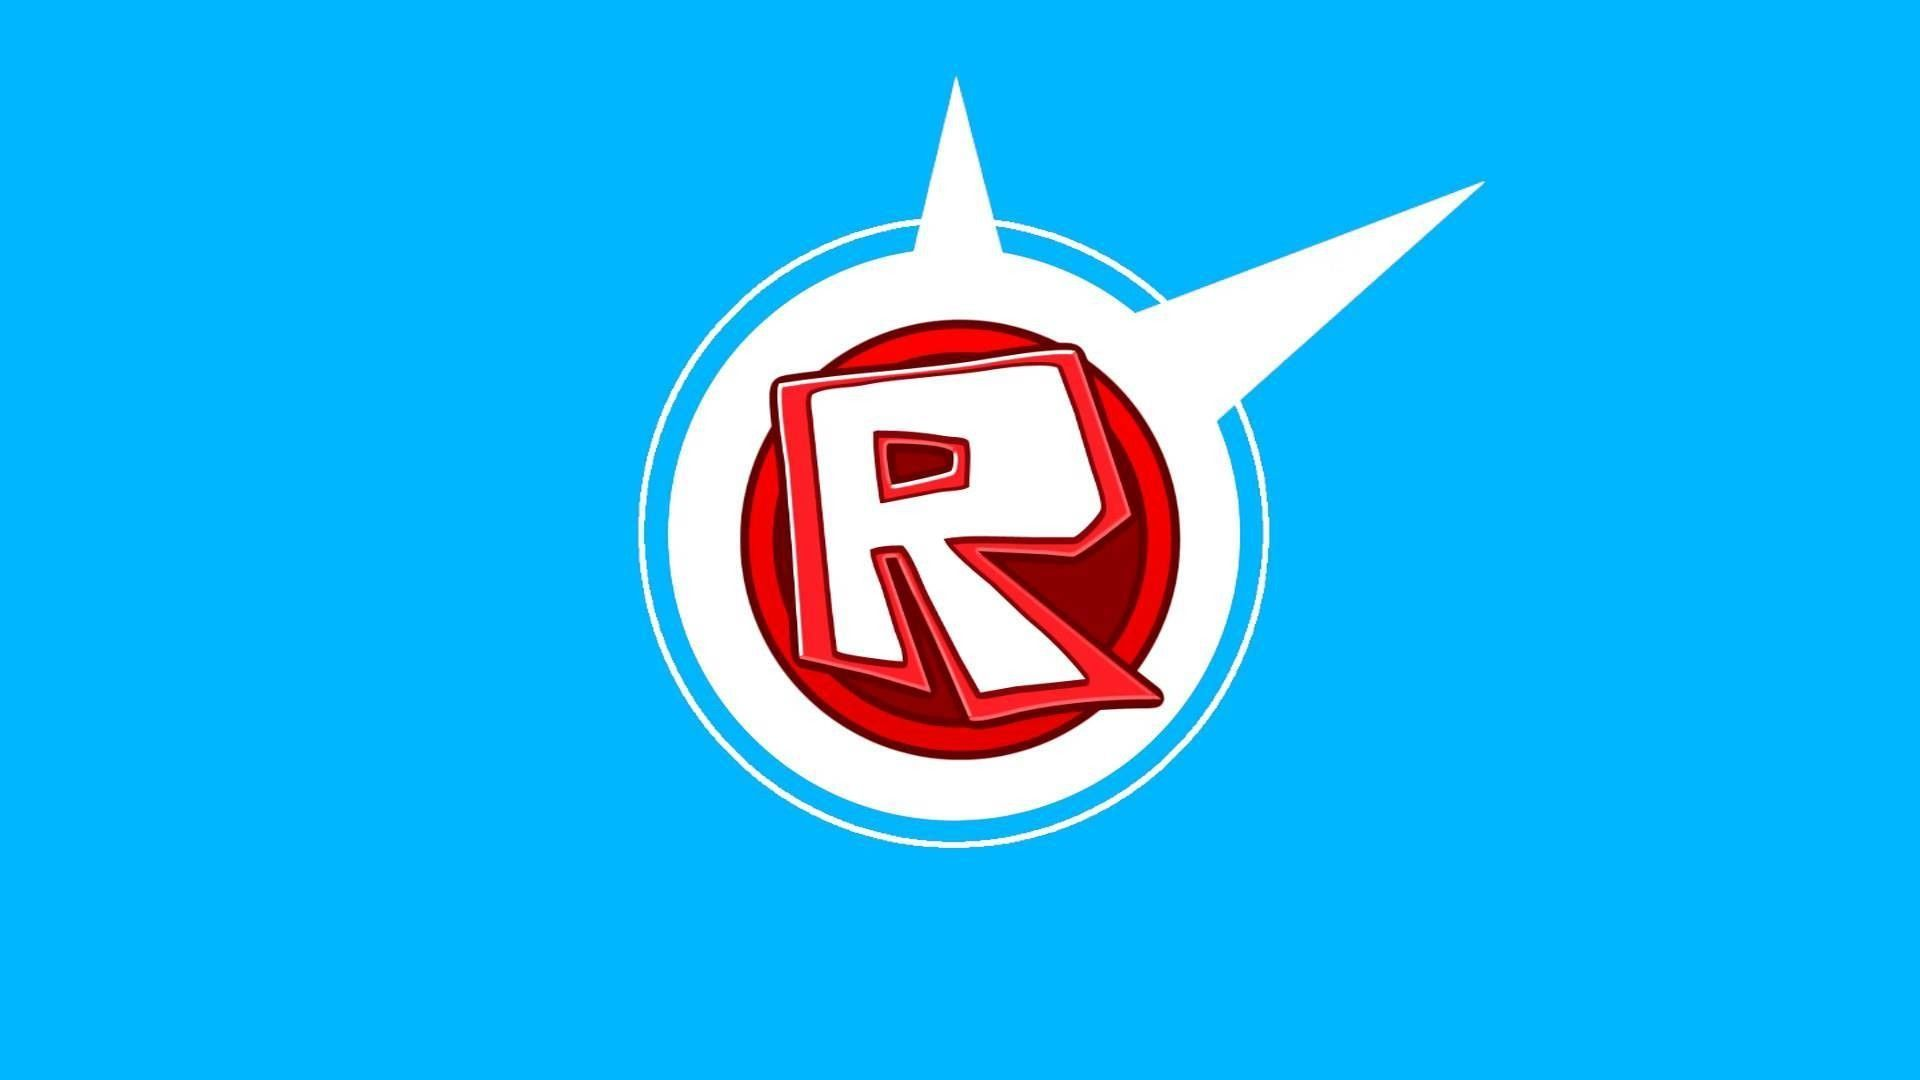 Roblox Logo Wallpapers Top Free Roblox Logo Backgrounds Wallpaperaccess Logo Maker Free Logos Roblox